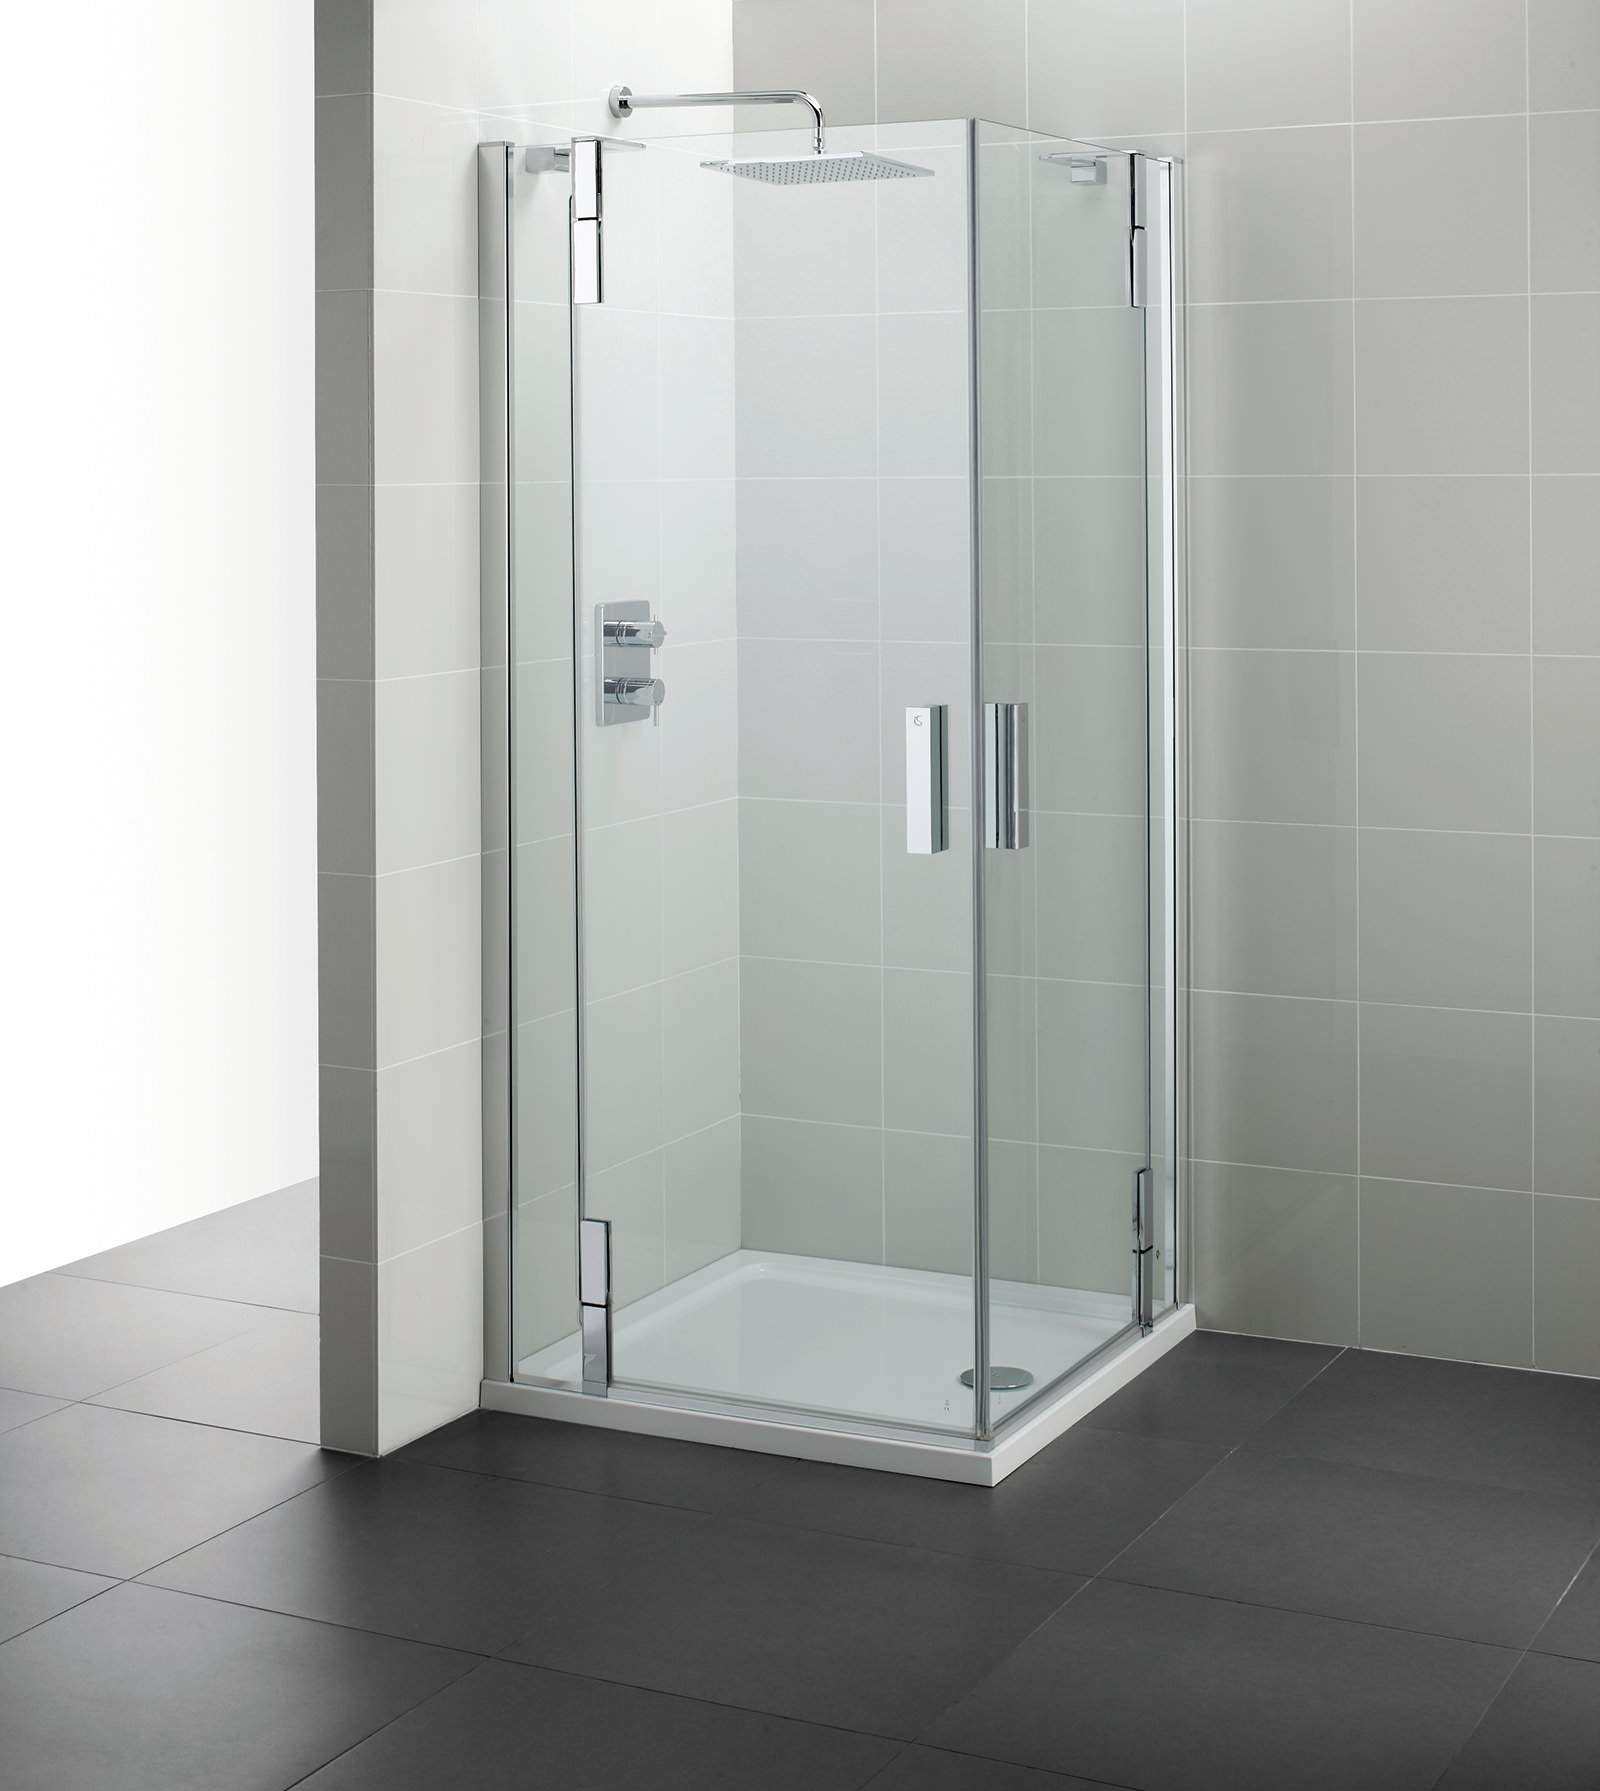 large corner shower units. Ideal Standard Tonic Flat Top 900mm Hinged Corner Entry  Twyford